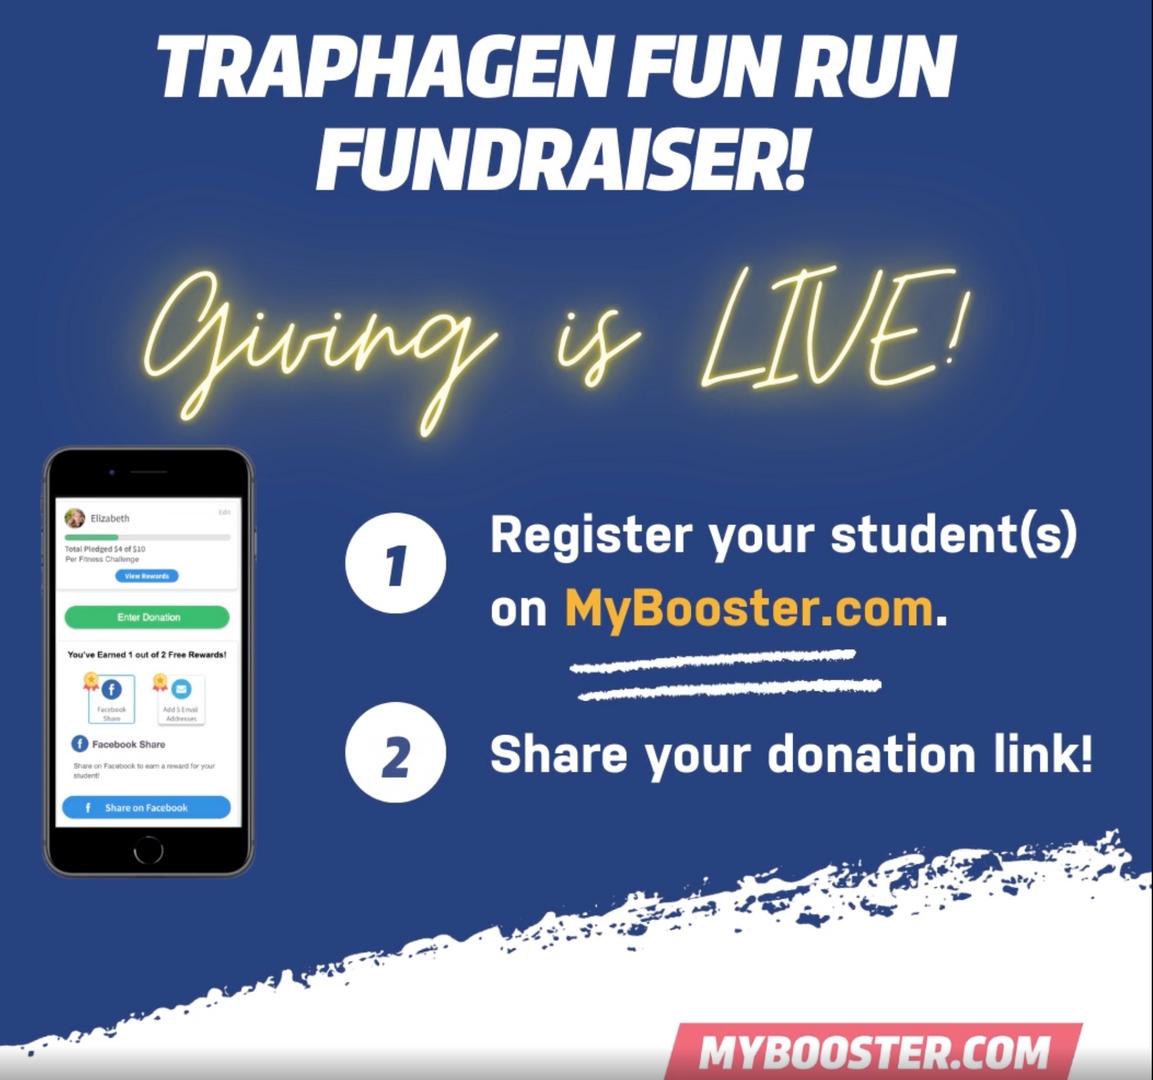 Traphagen Fun Run Fundraiser